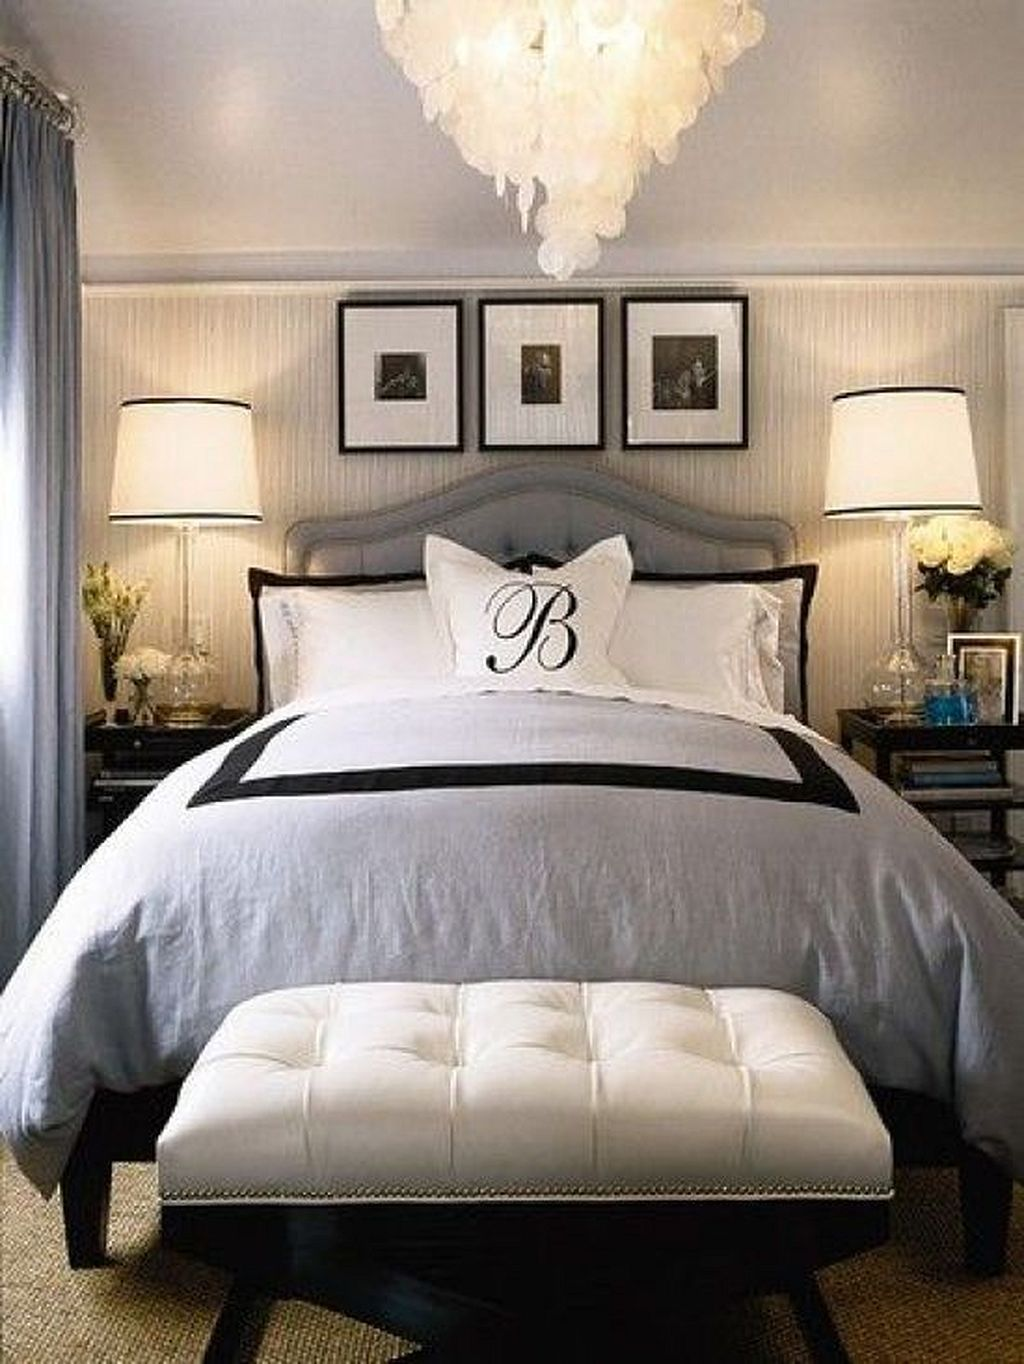 Master bedroom decorating ideas gray   Fancy Master Bedroom Decorating Ideas  Master bedroom